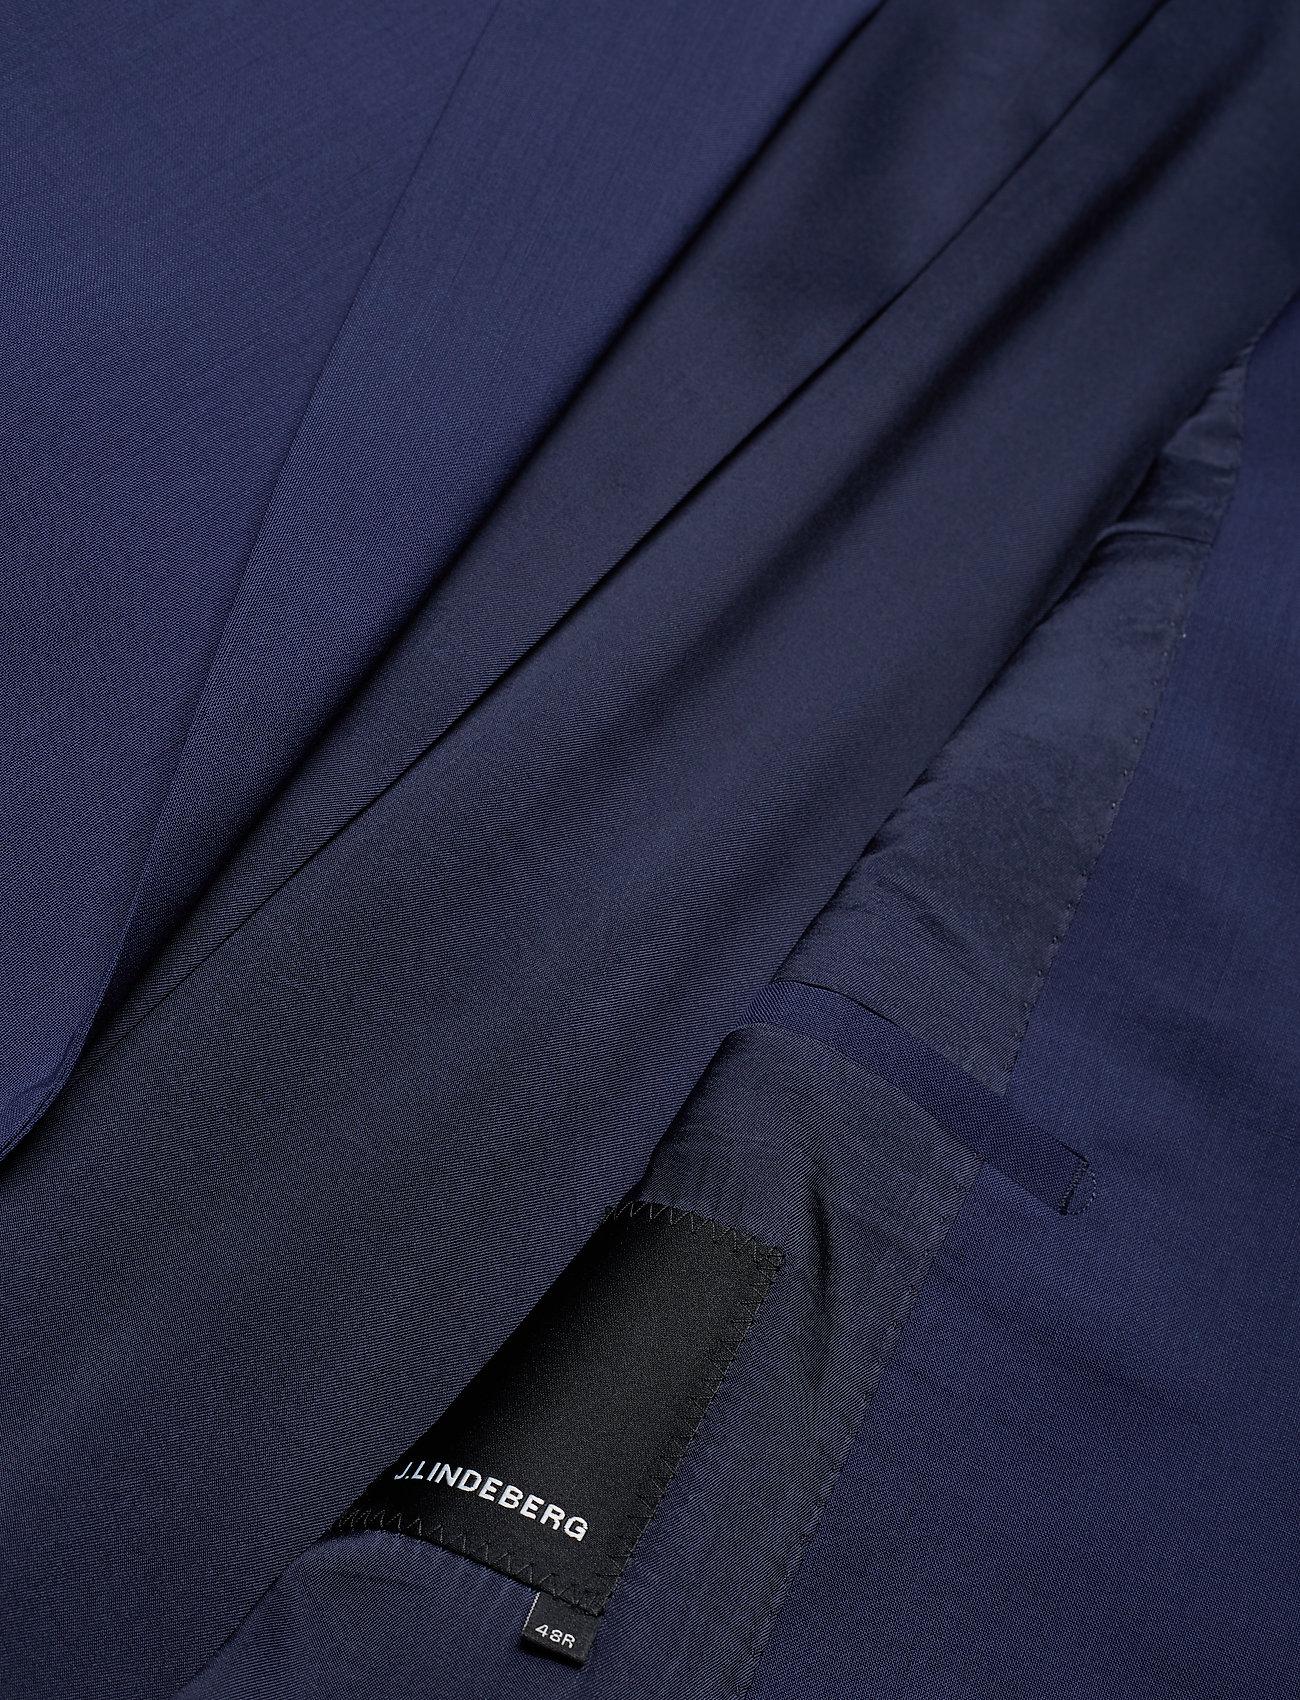 Woolmid BlueJLindeberg p Hopper comfort Soft TcuJ1l3FK